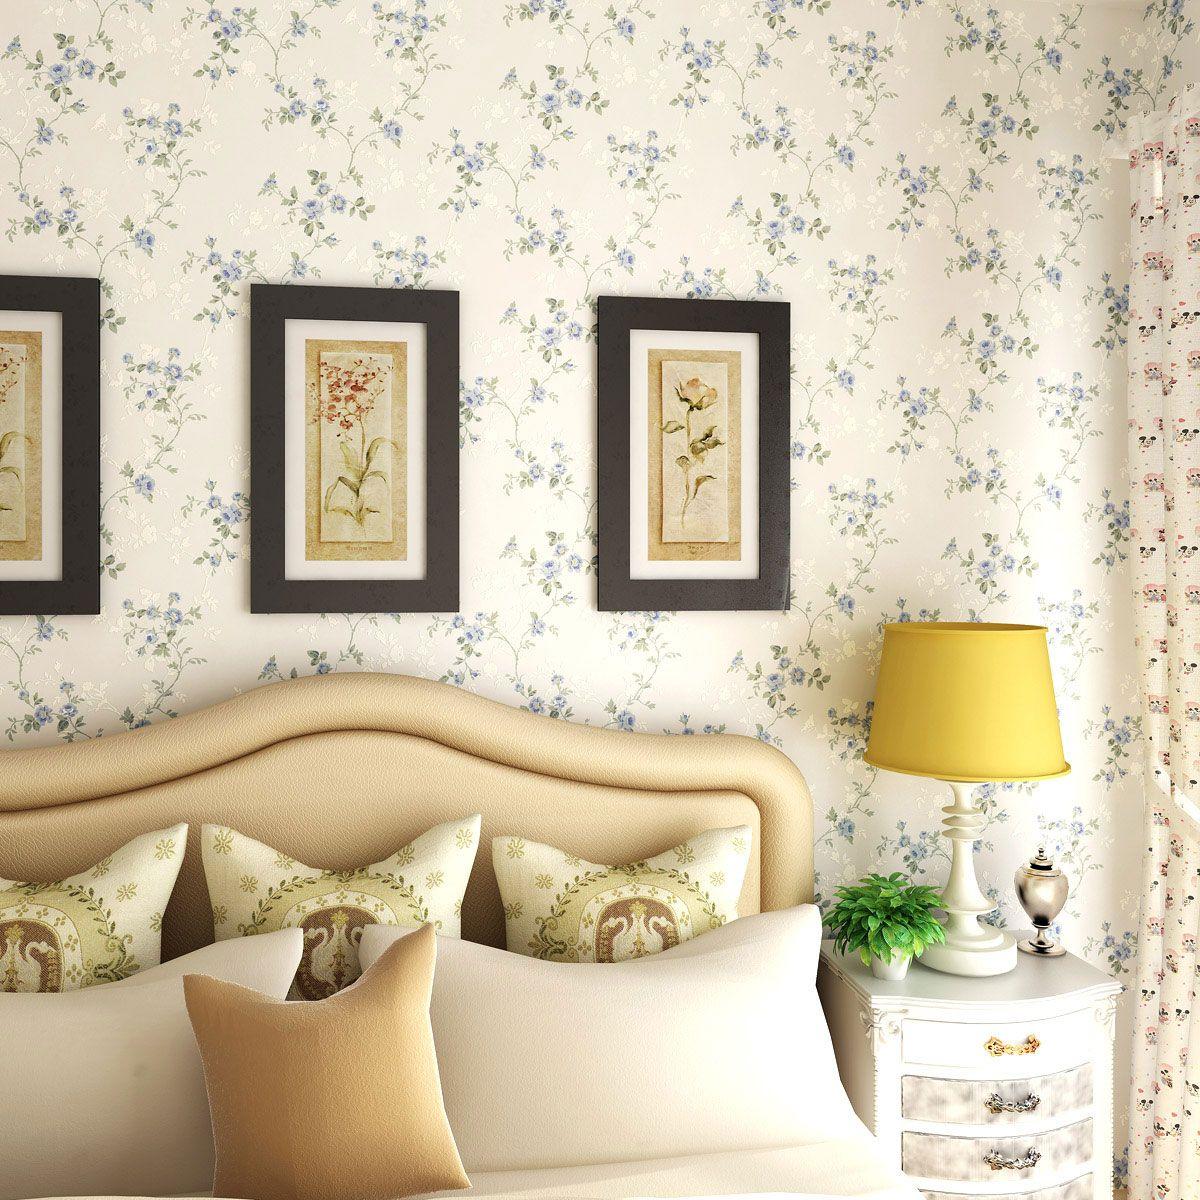 Vintage Bedroom Wallpaper | WallpaperHDC.com | {interiors ...